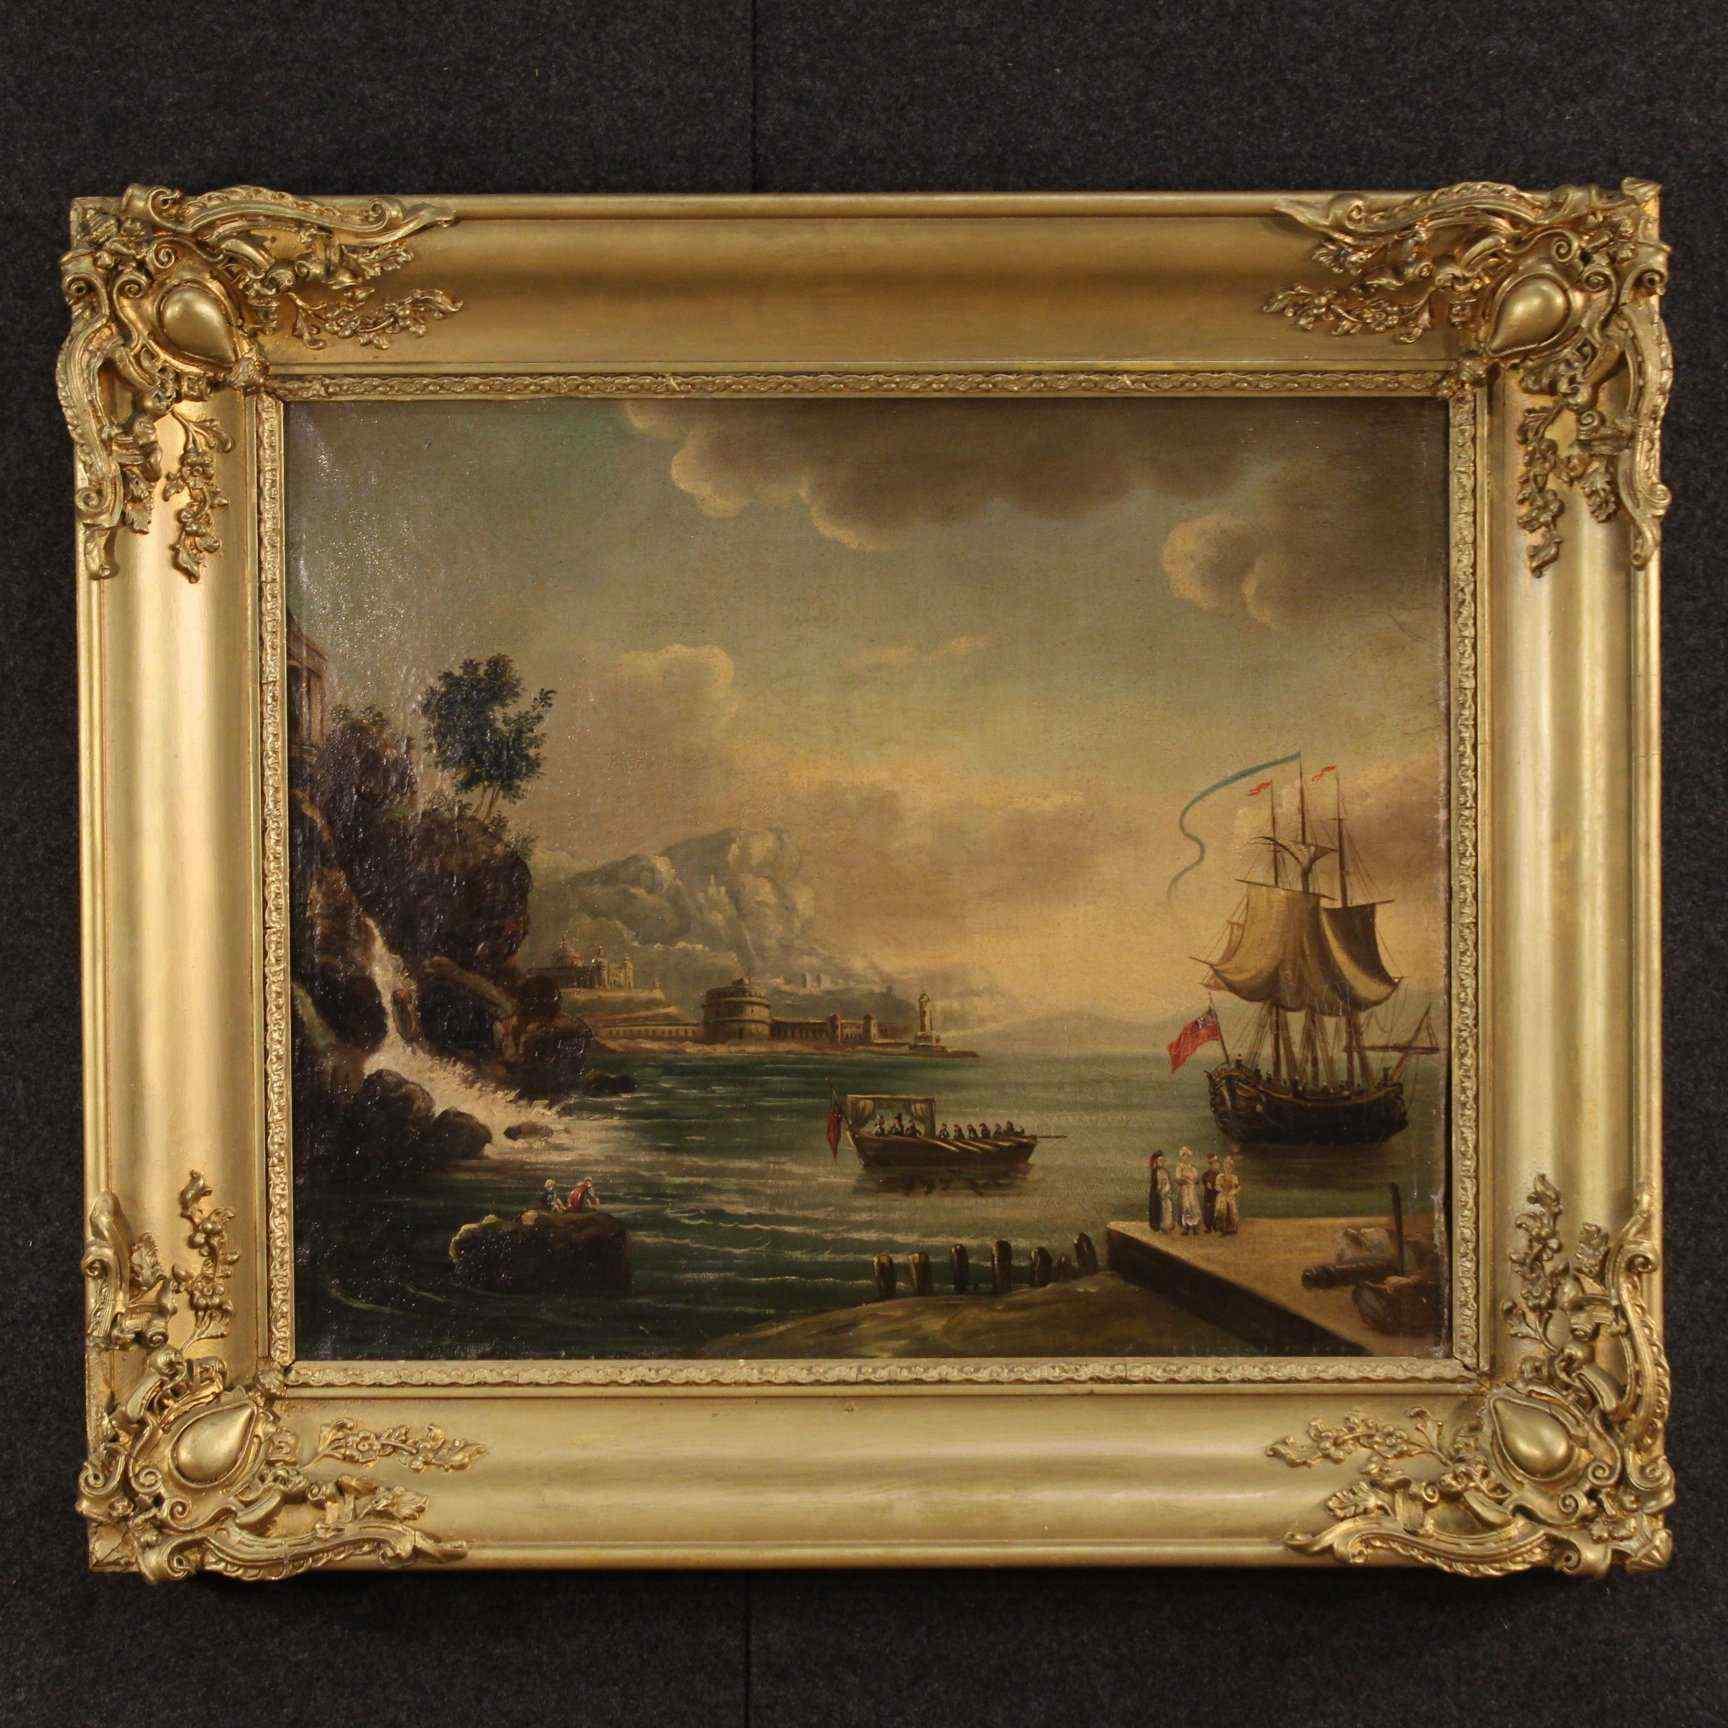 Old Navy французской живописи конца девятнадцатого века